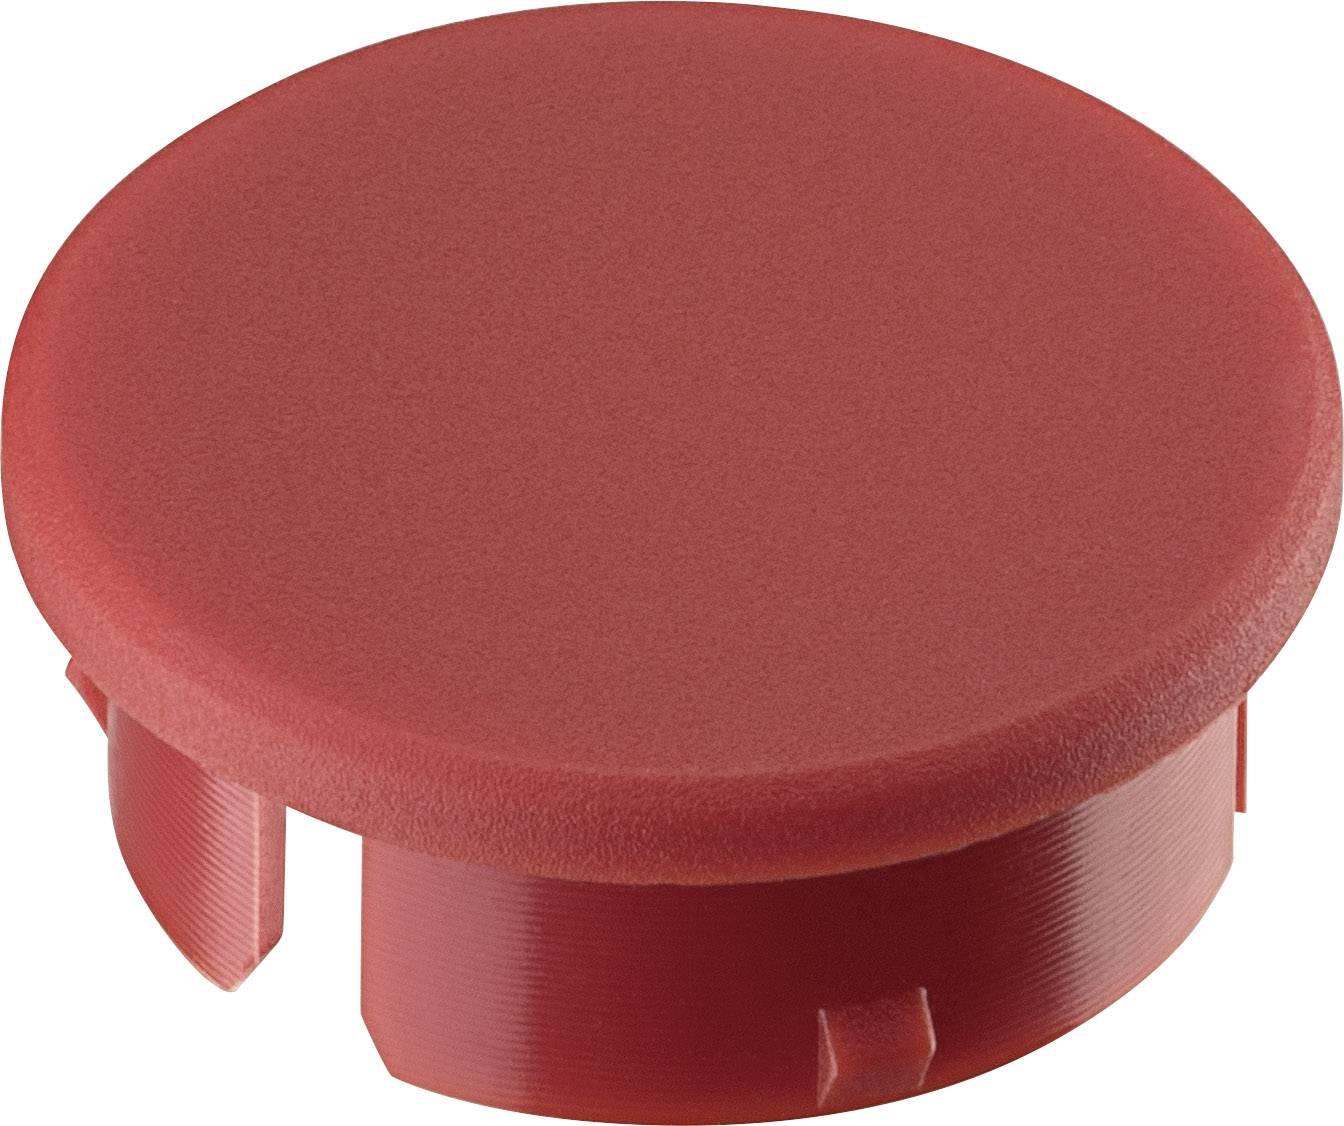 Krytka knoflíku Ritel 30 21 10 4 15.4 mm, červená, 1 ks